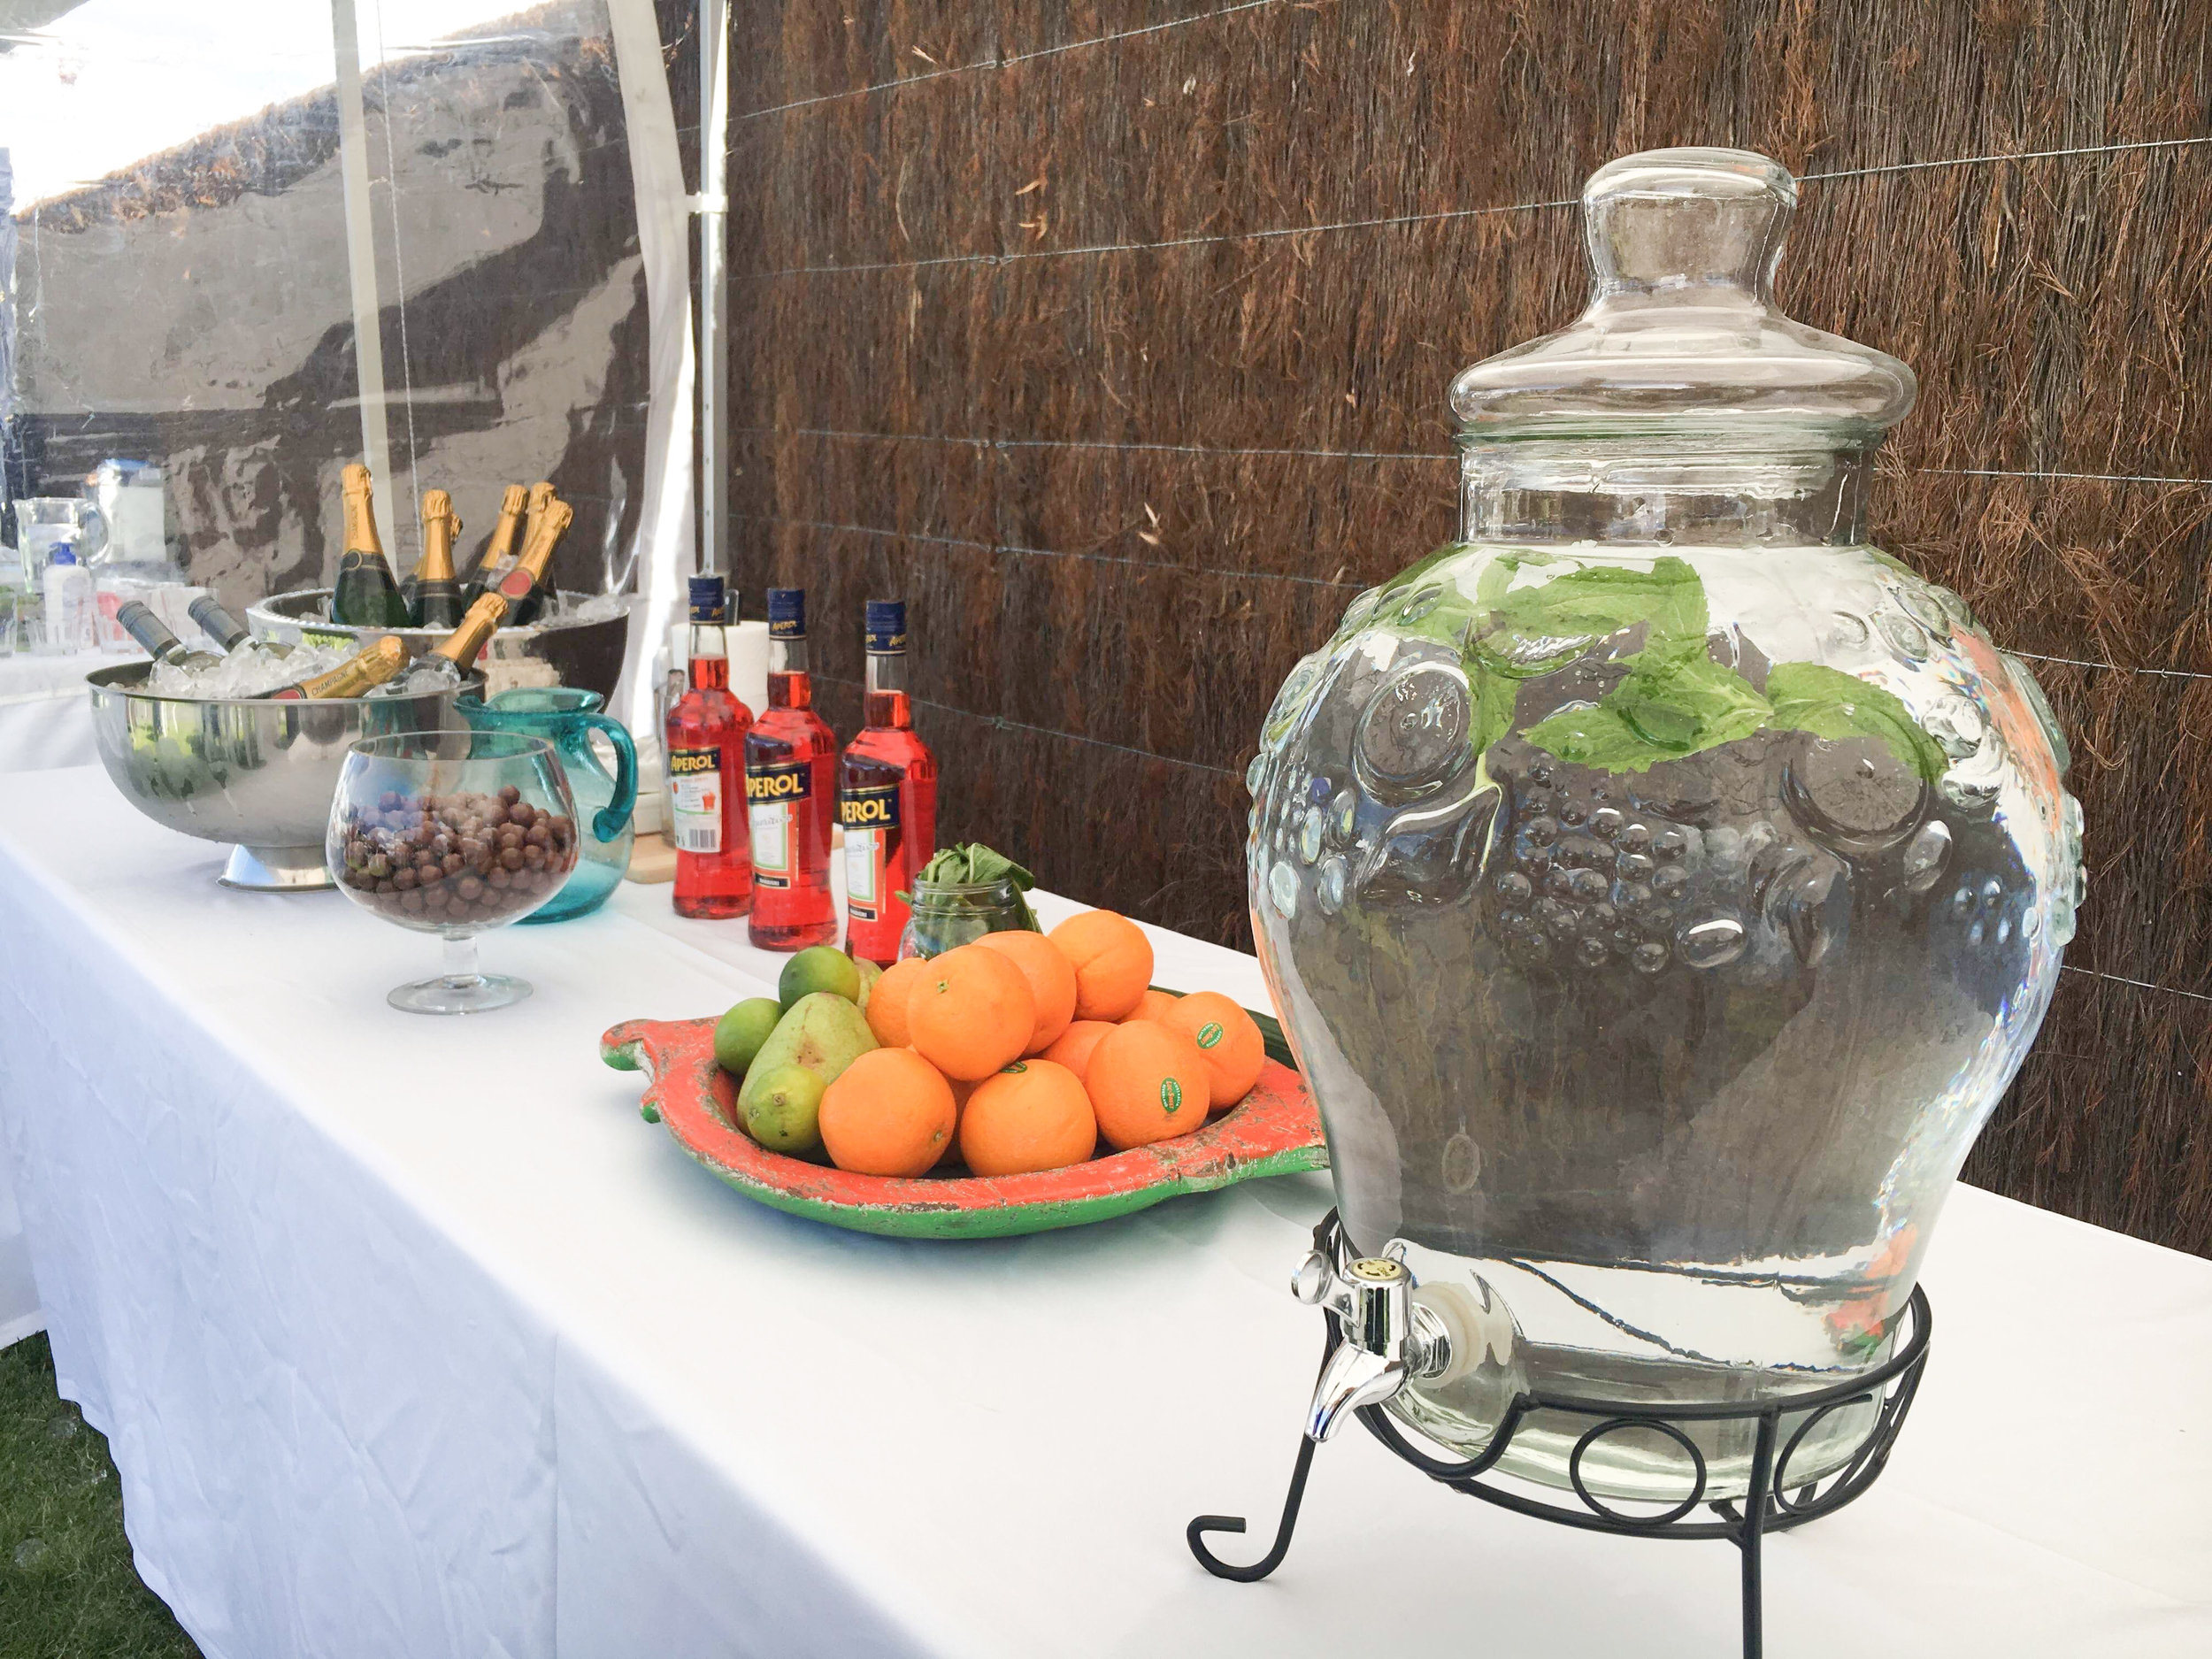 Sweet Mango catering image 2.jpg